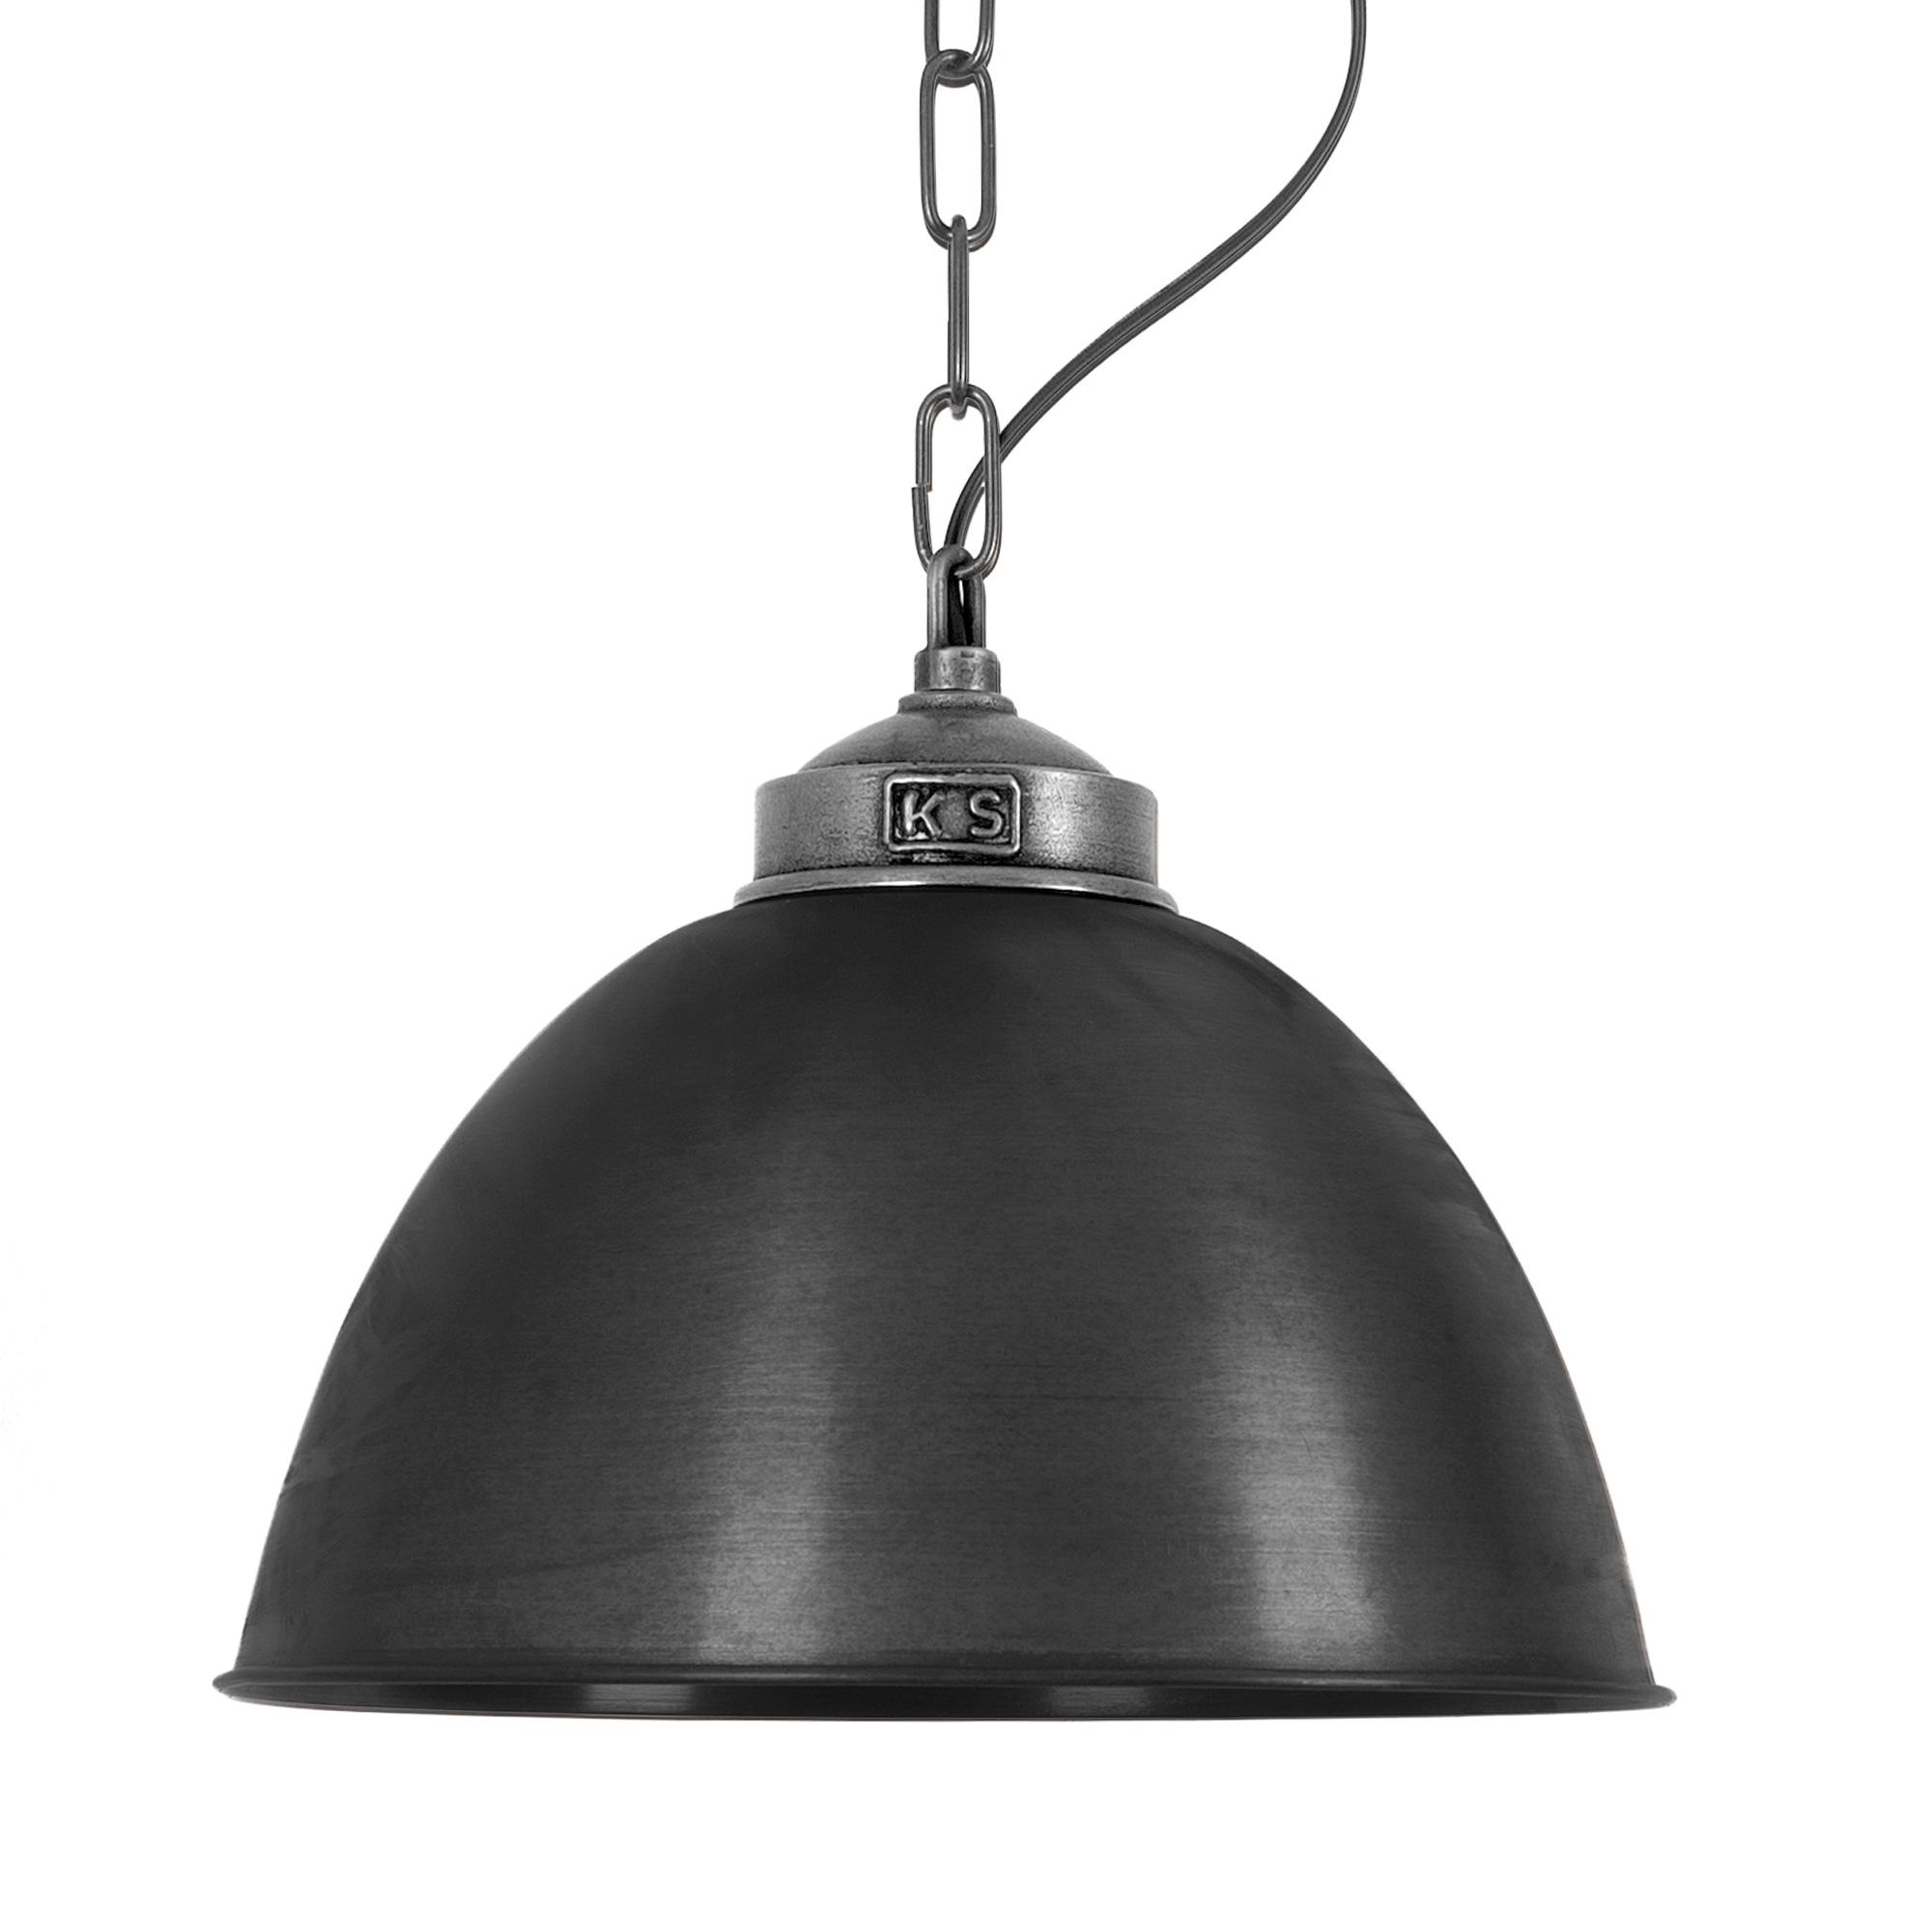 Hanglamp Loft ll antraciet